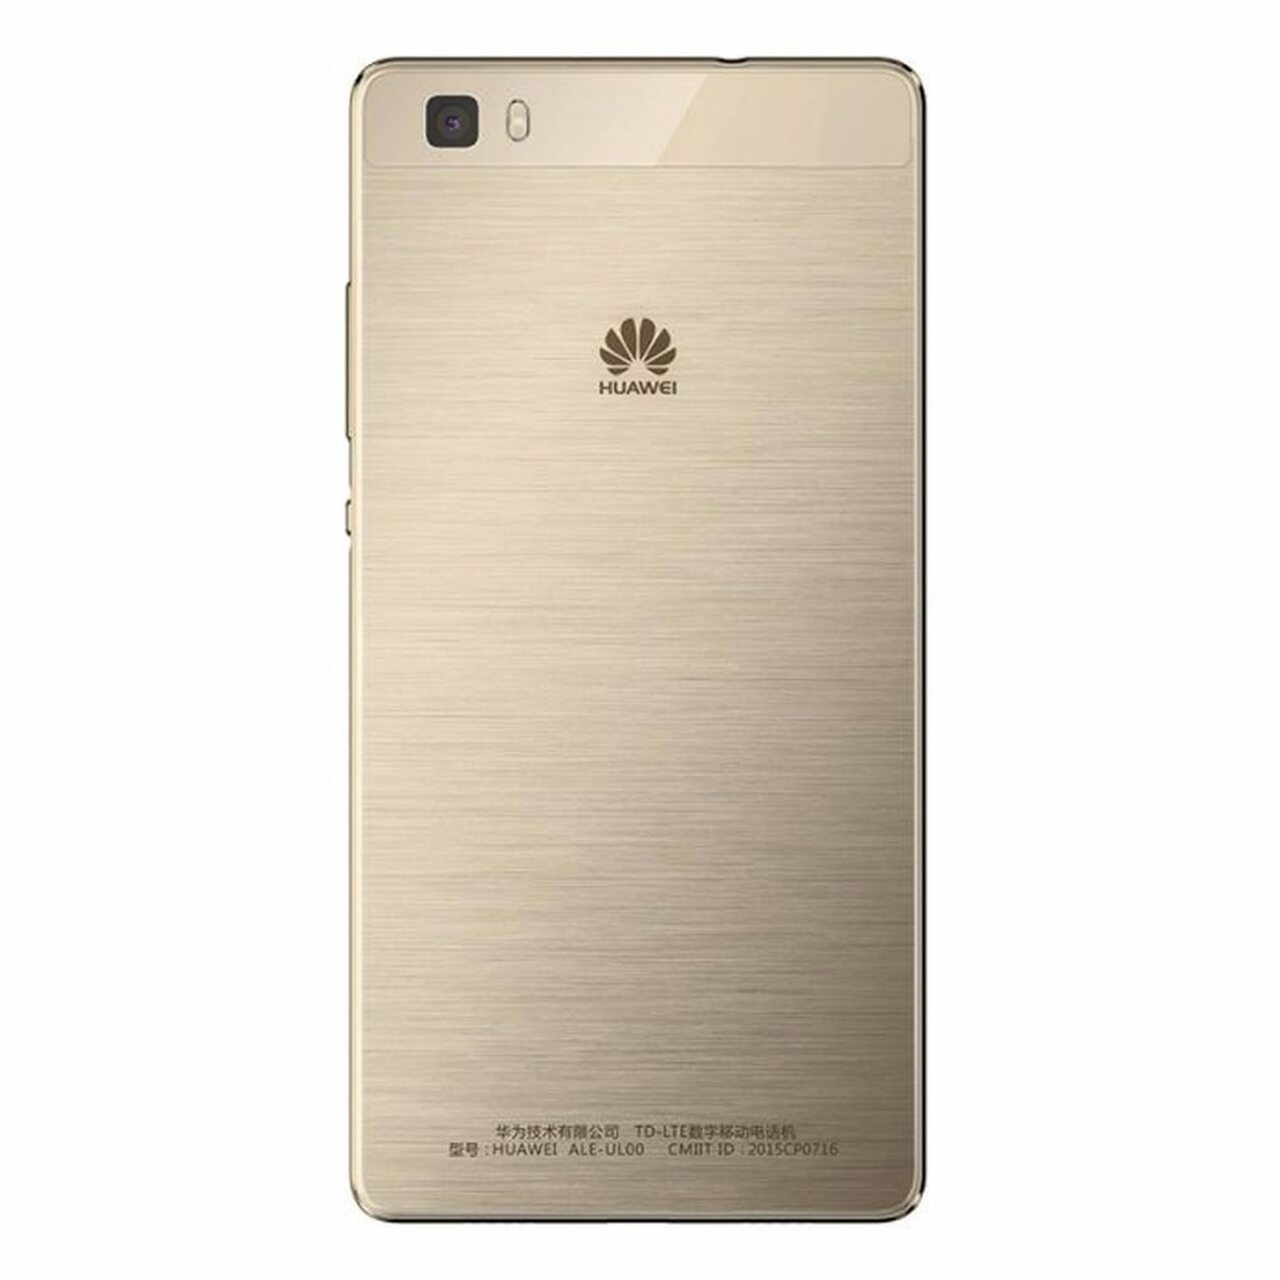 750fa8ccf38 ... International Firmware HuaWei P8 Lite 4G LTE Cell Phone Kirin 620  Android 5.0 5.0